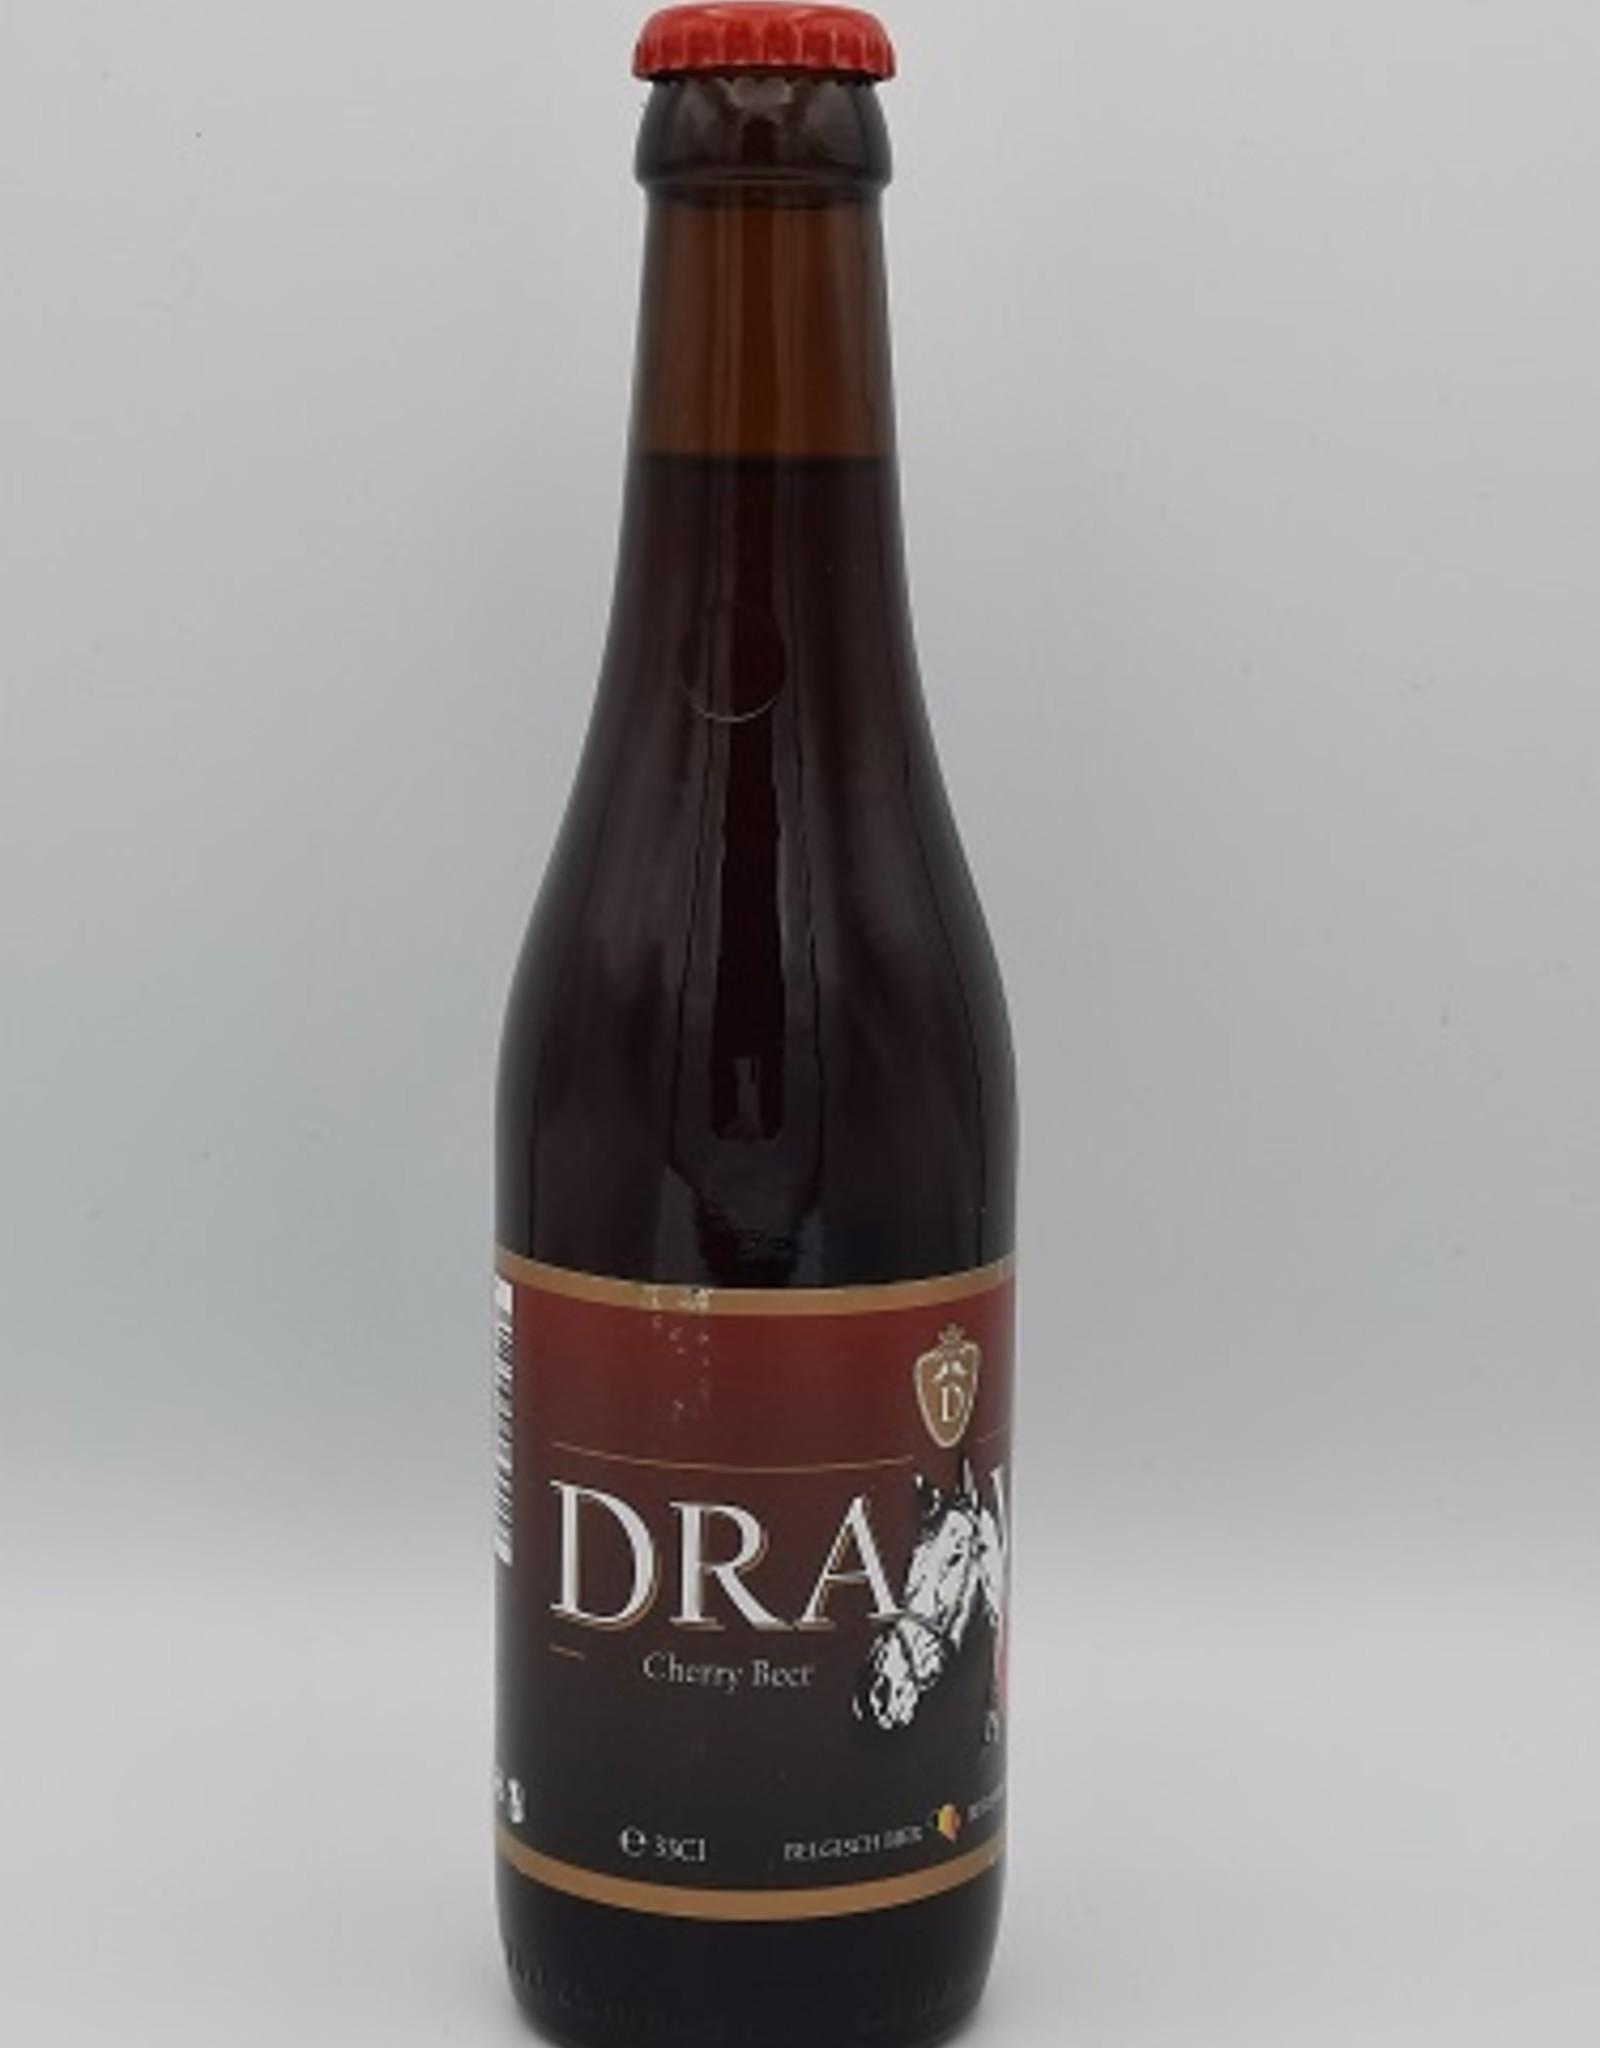 Draver Draver cherry